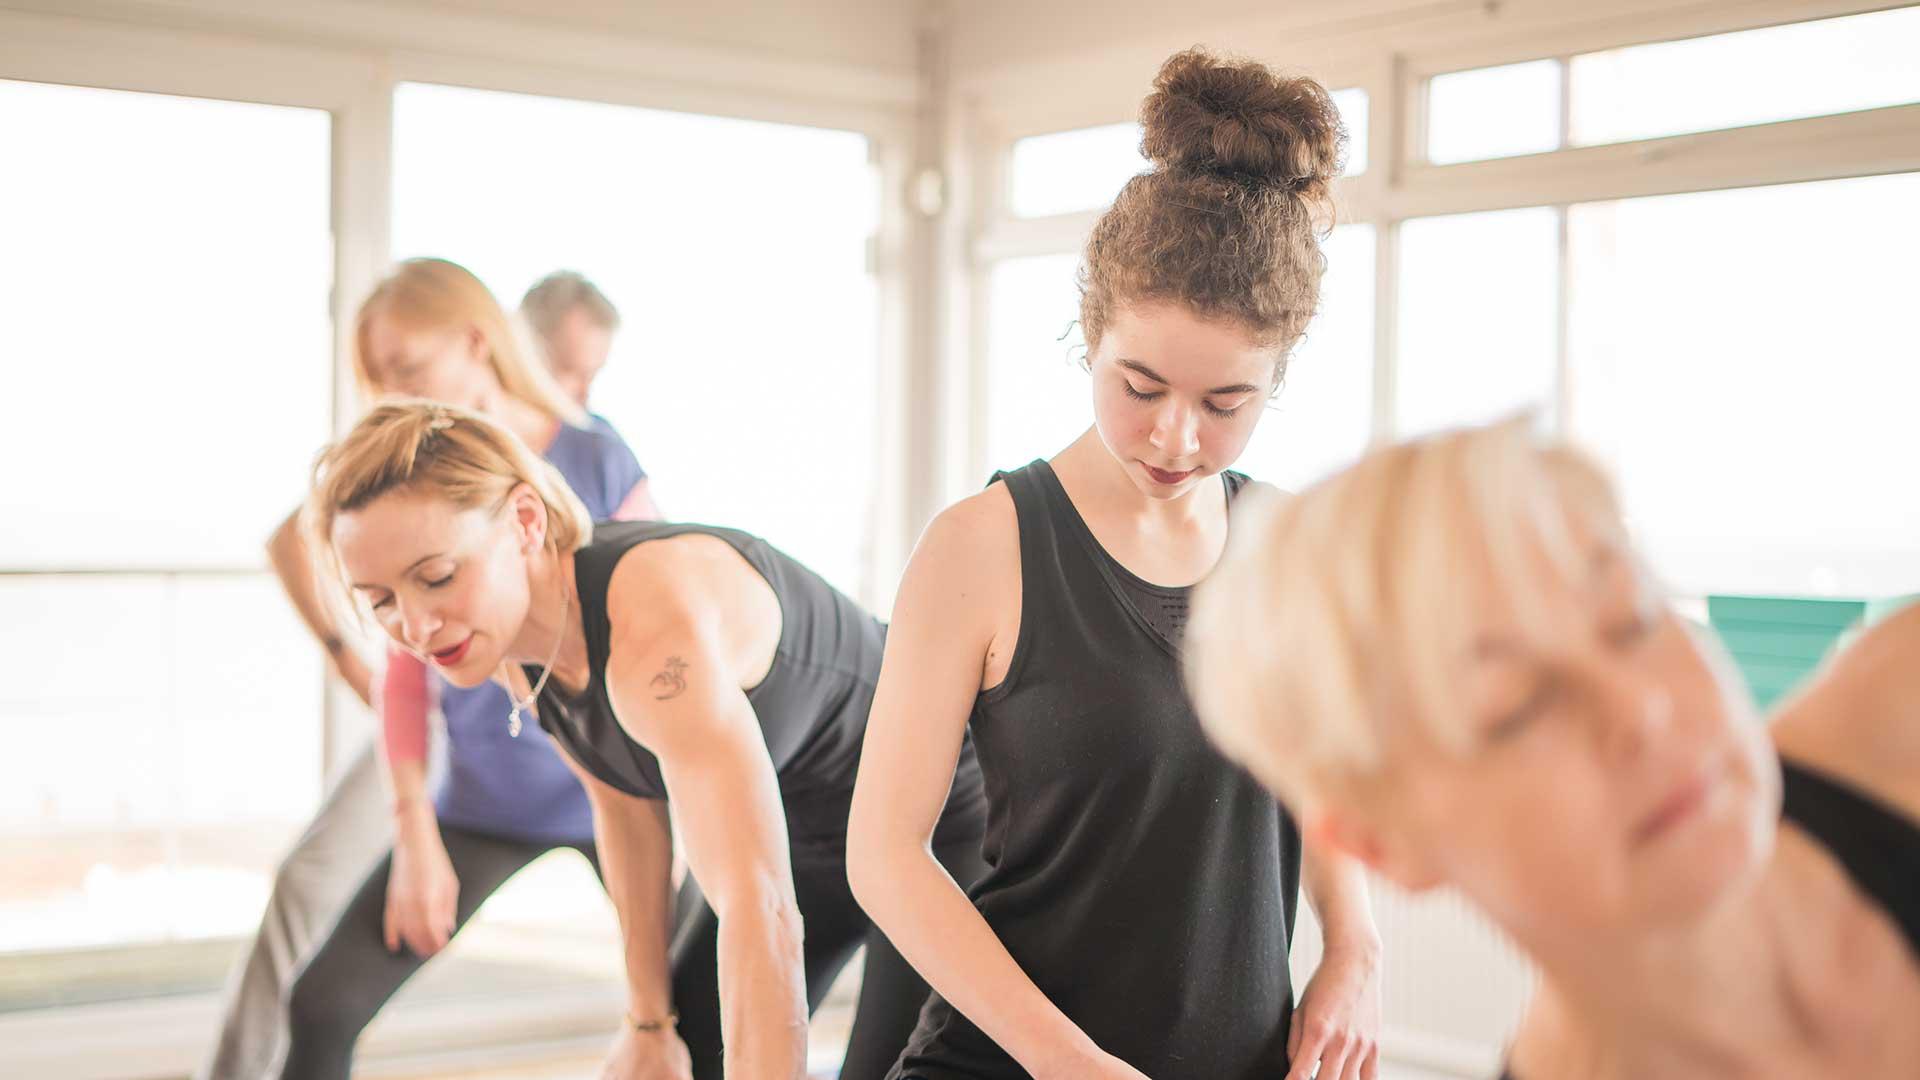 Young women practising pilates in a studio.